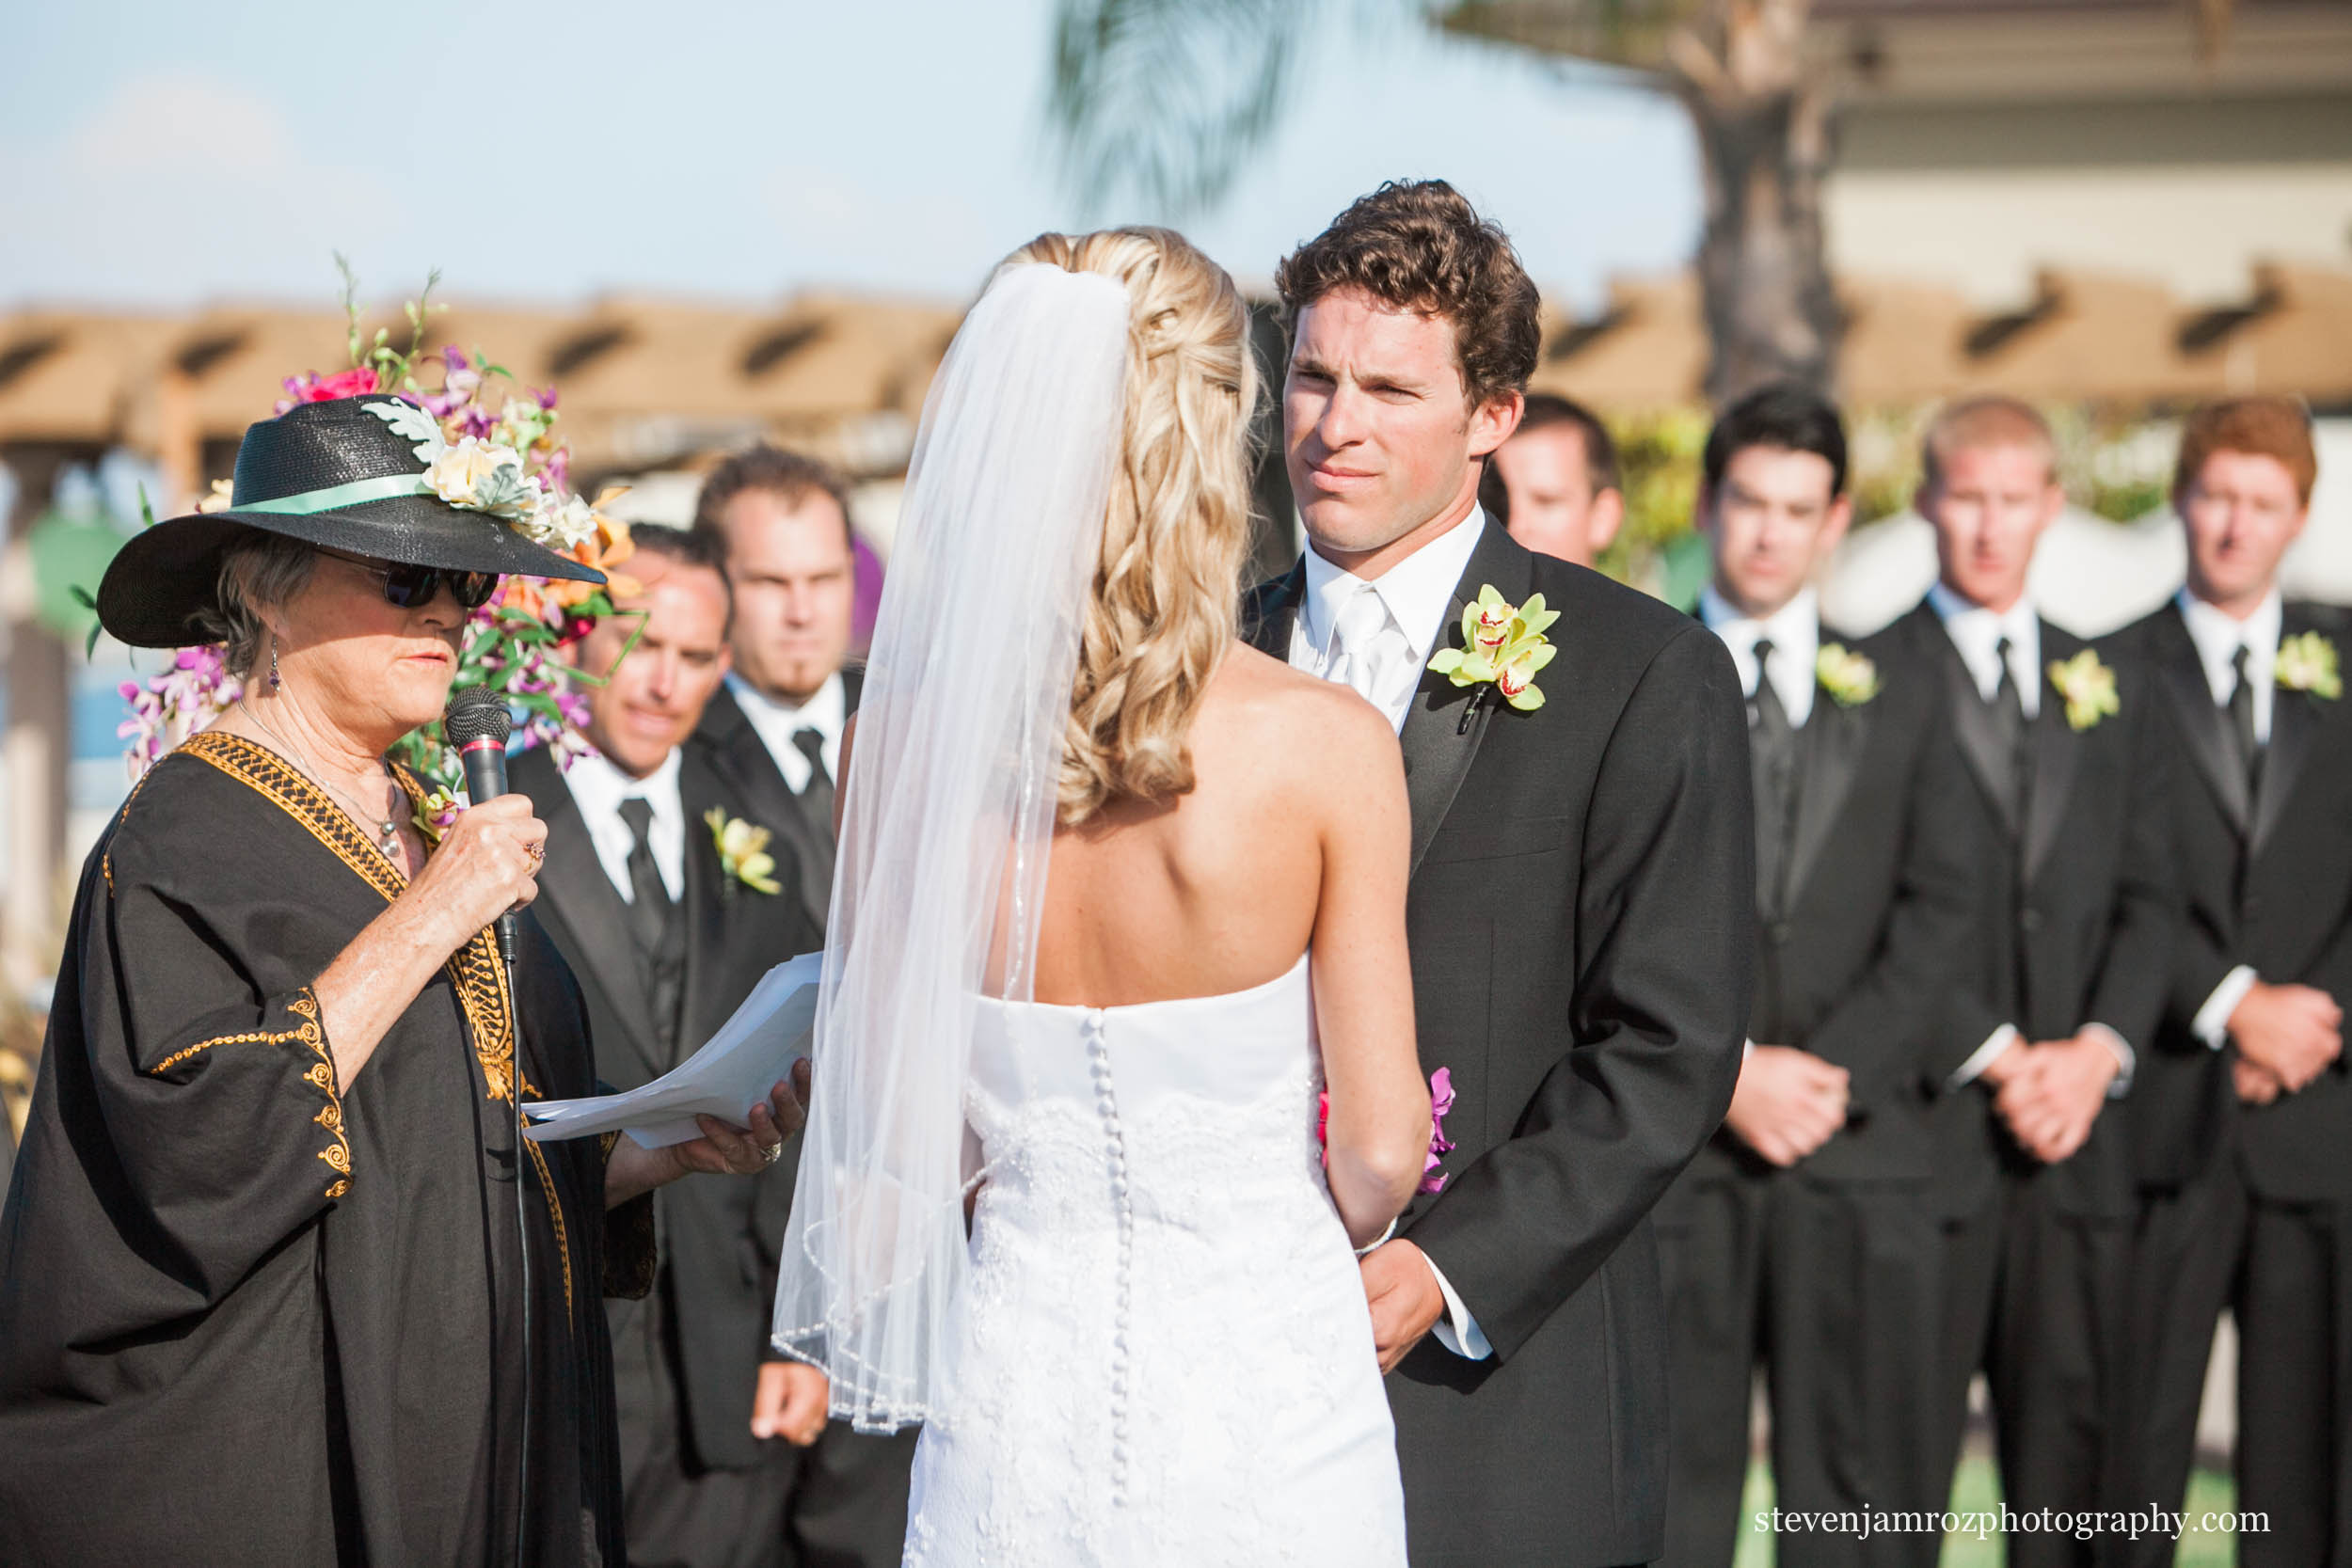 outdoor-wedding-ceremony-raleigh-nc-steven-jamroz-photography-0067.jpg